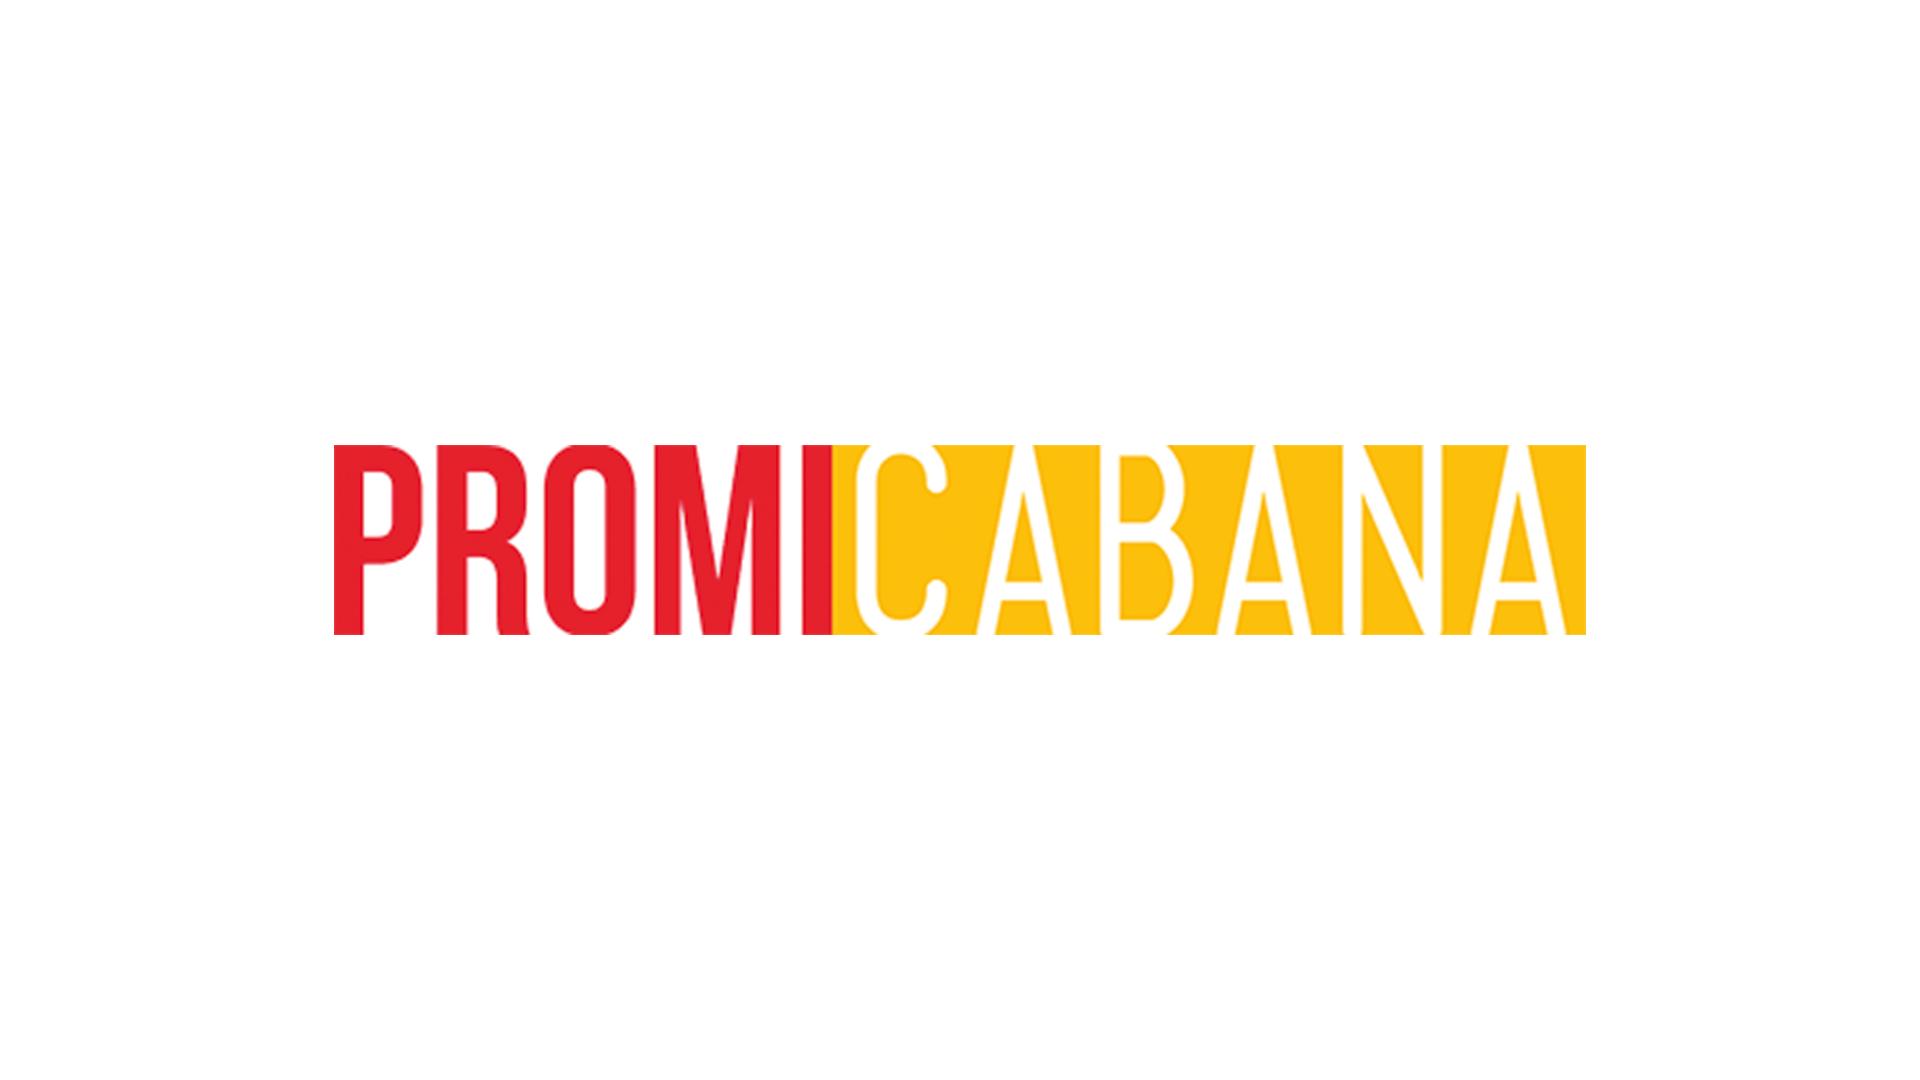 Cameron diaz jason segel sex tape remarkable